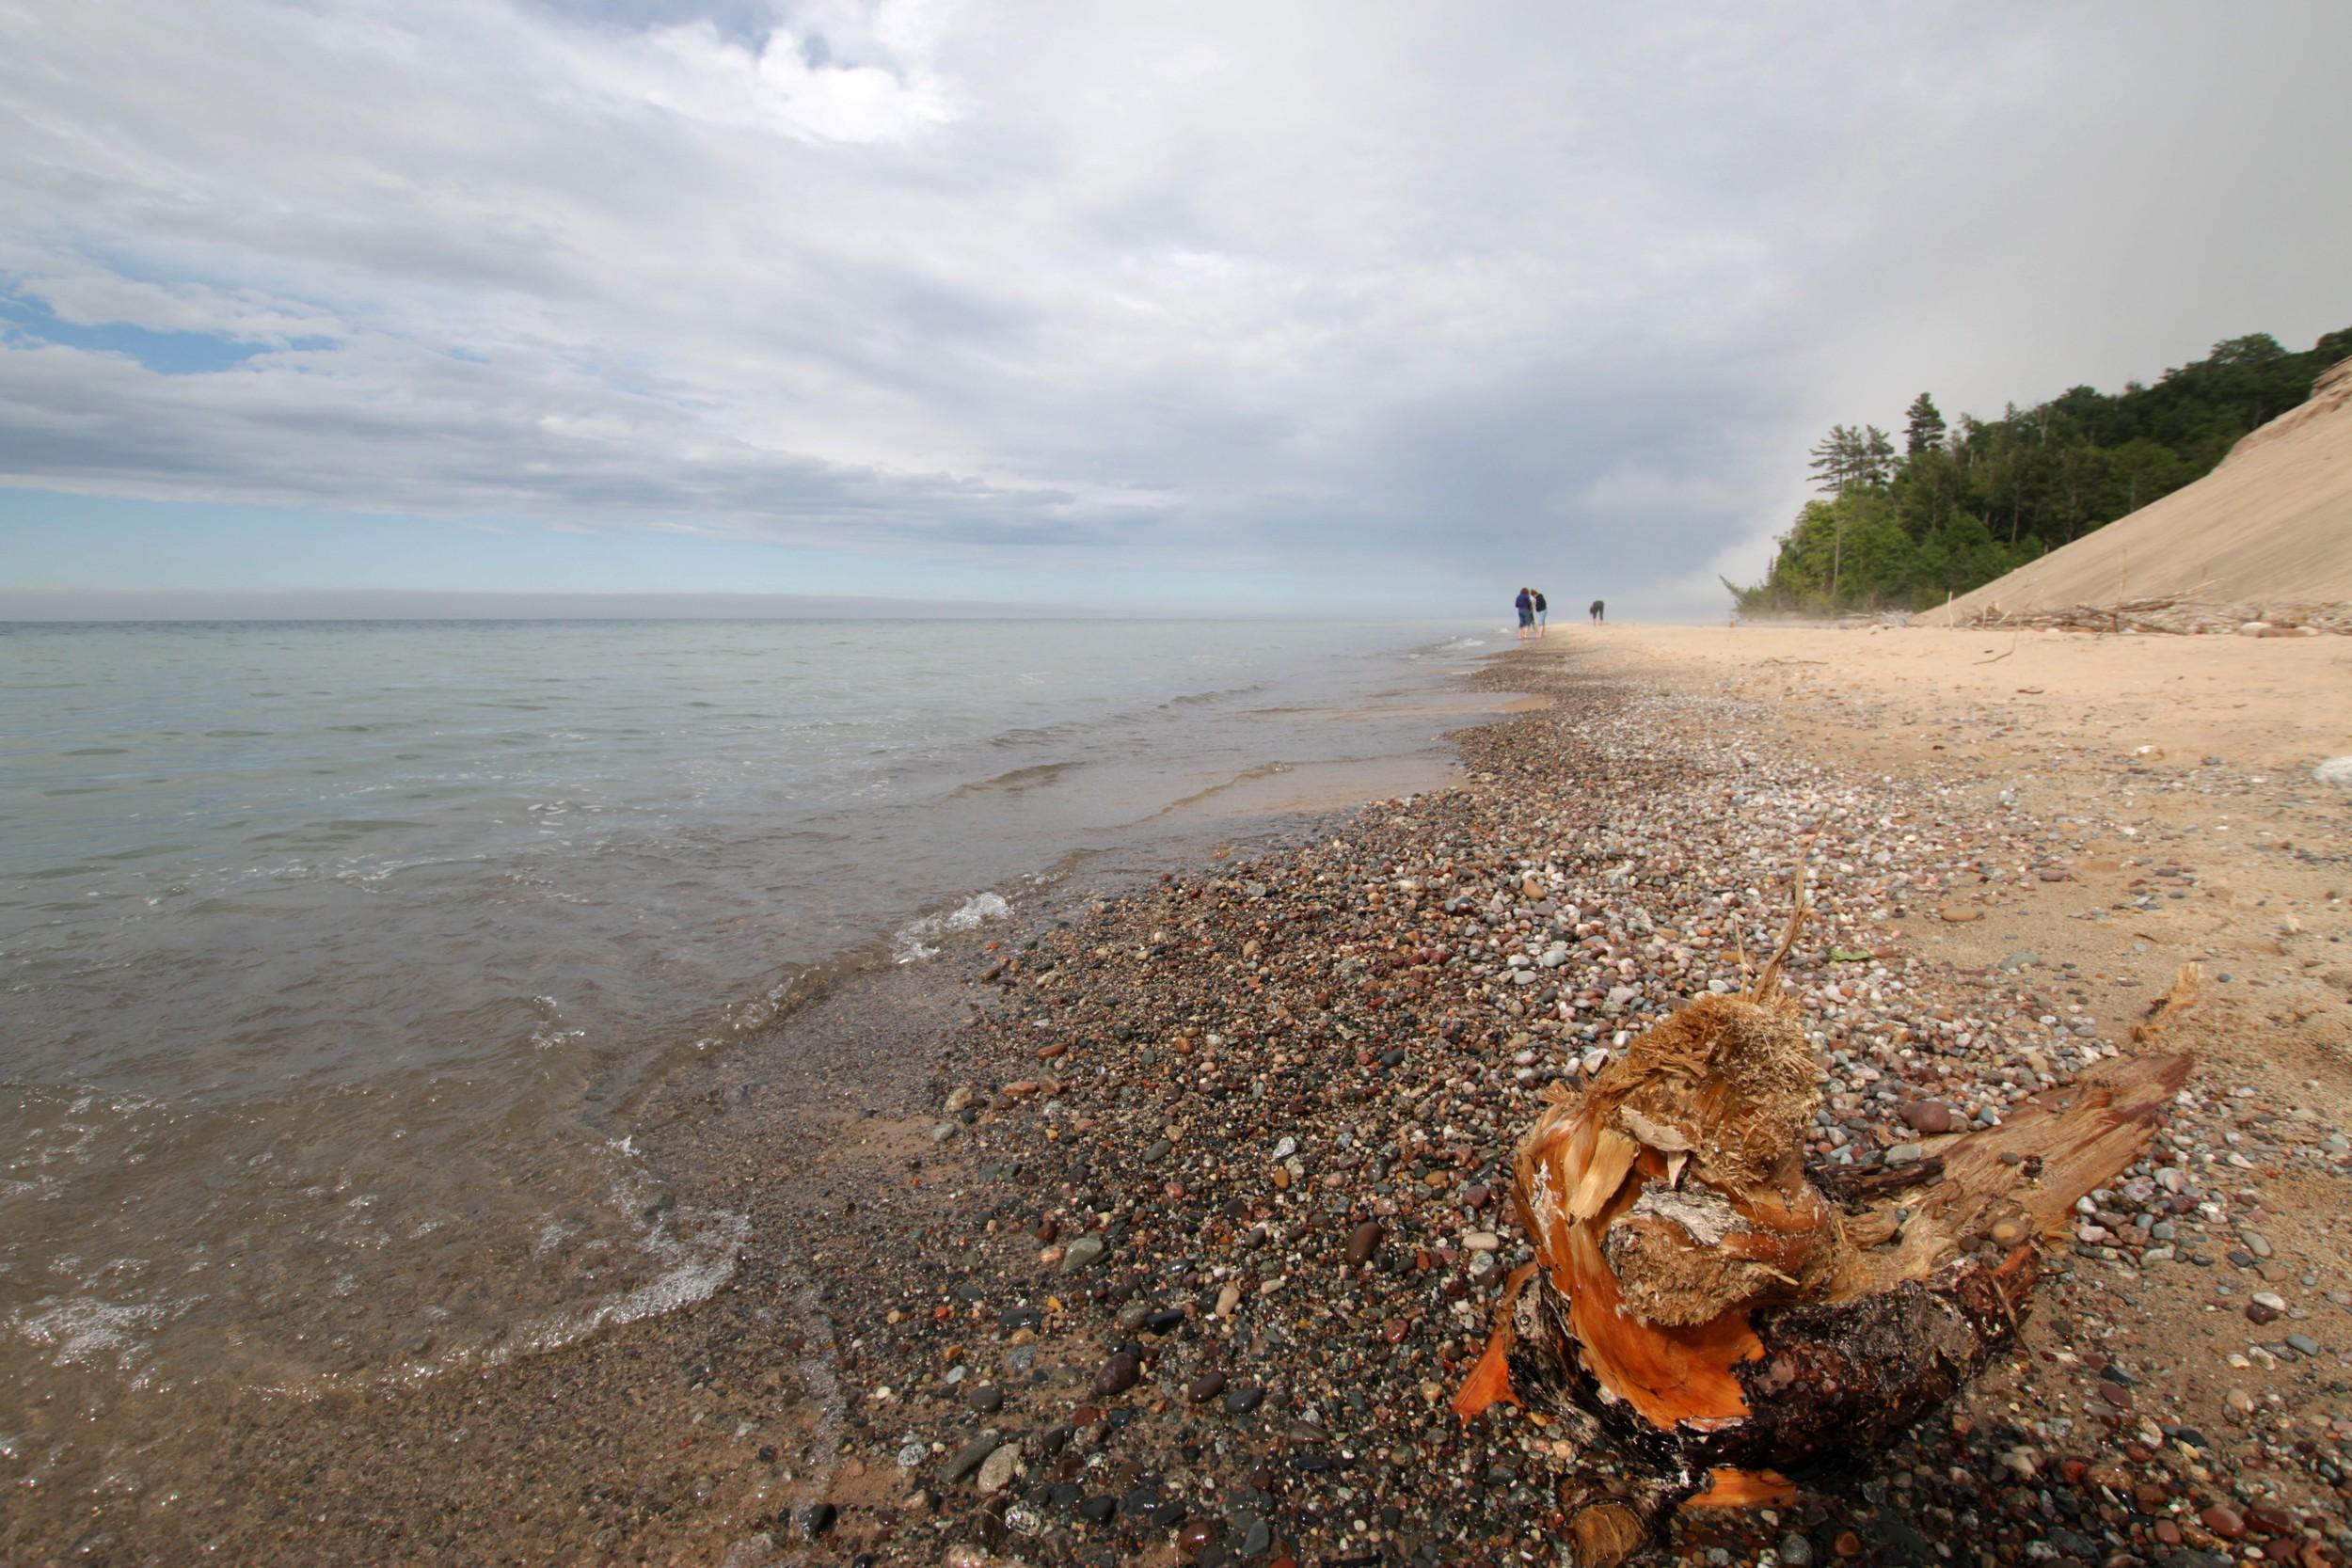 Beach- Pictured Rocks National Lakeshore, Grand Marais, MI - July 2014